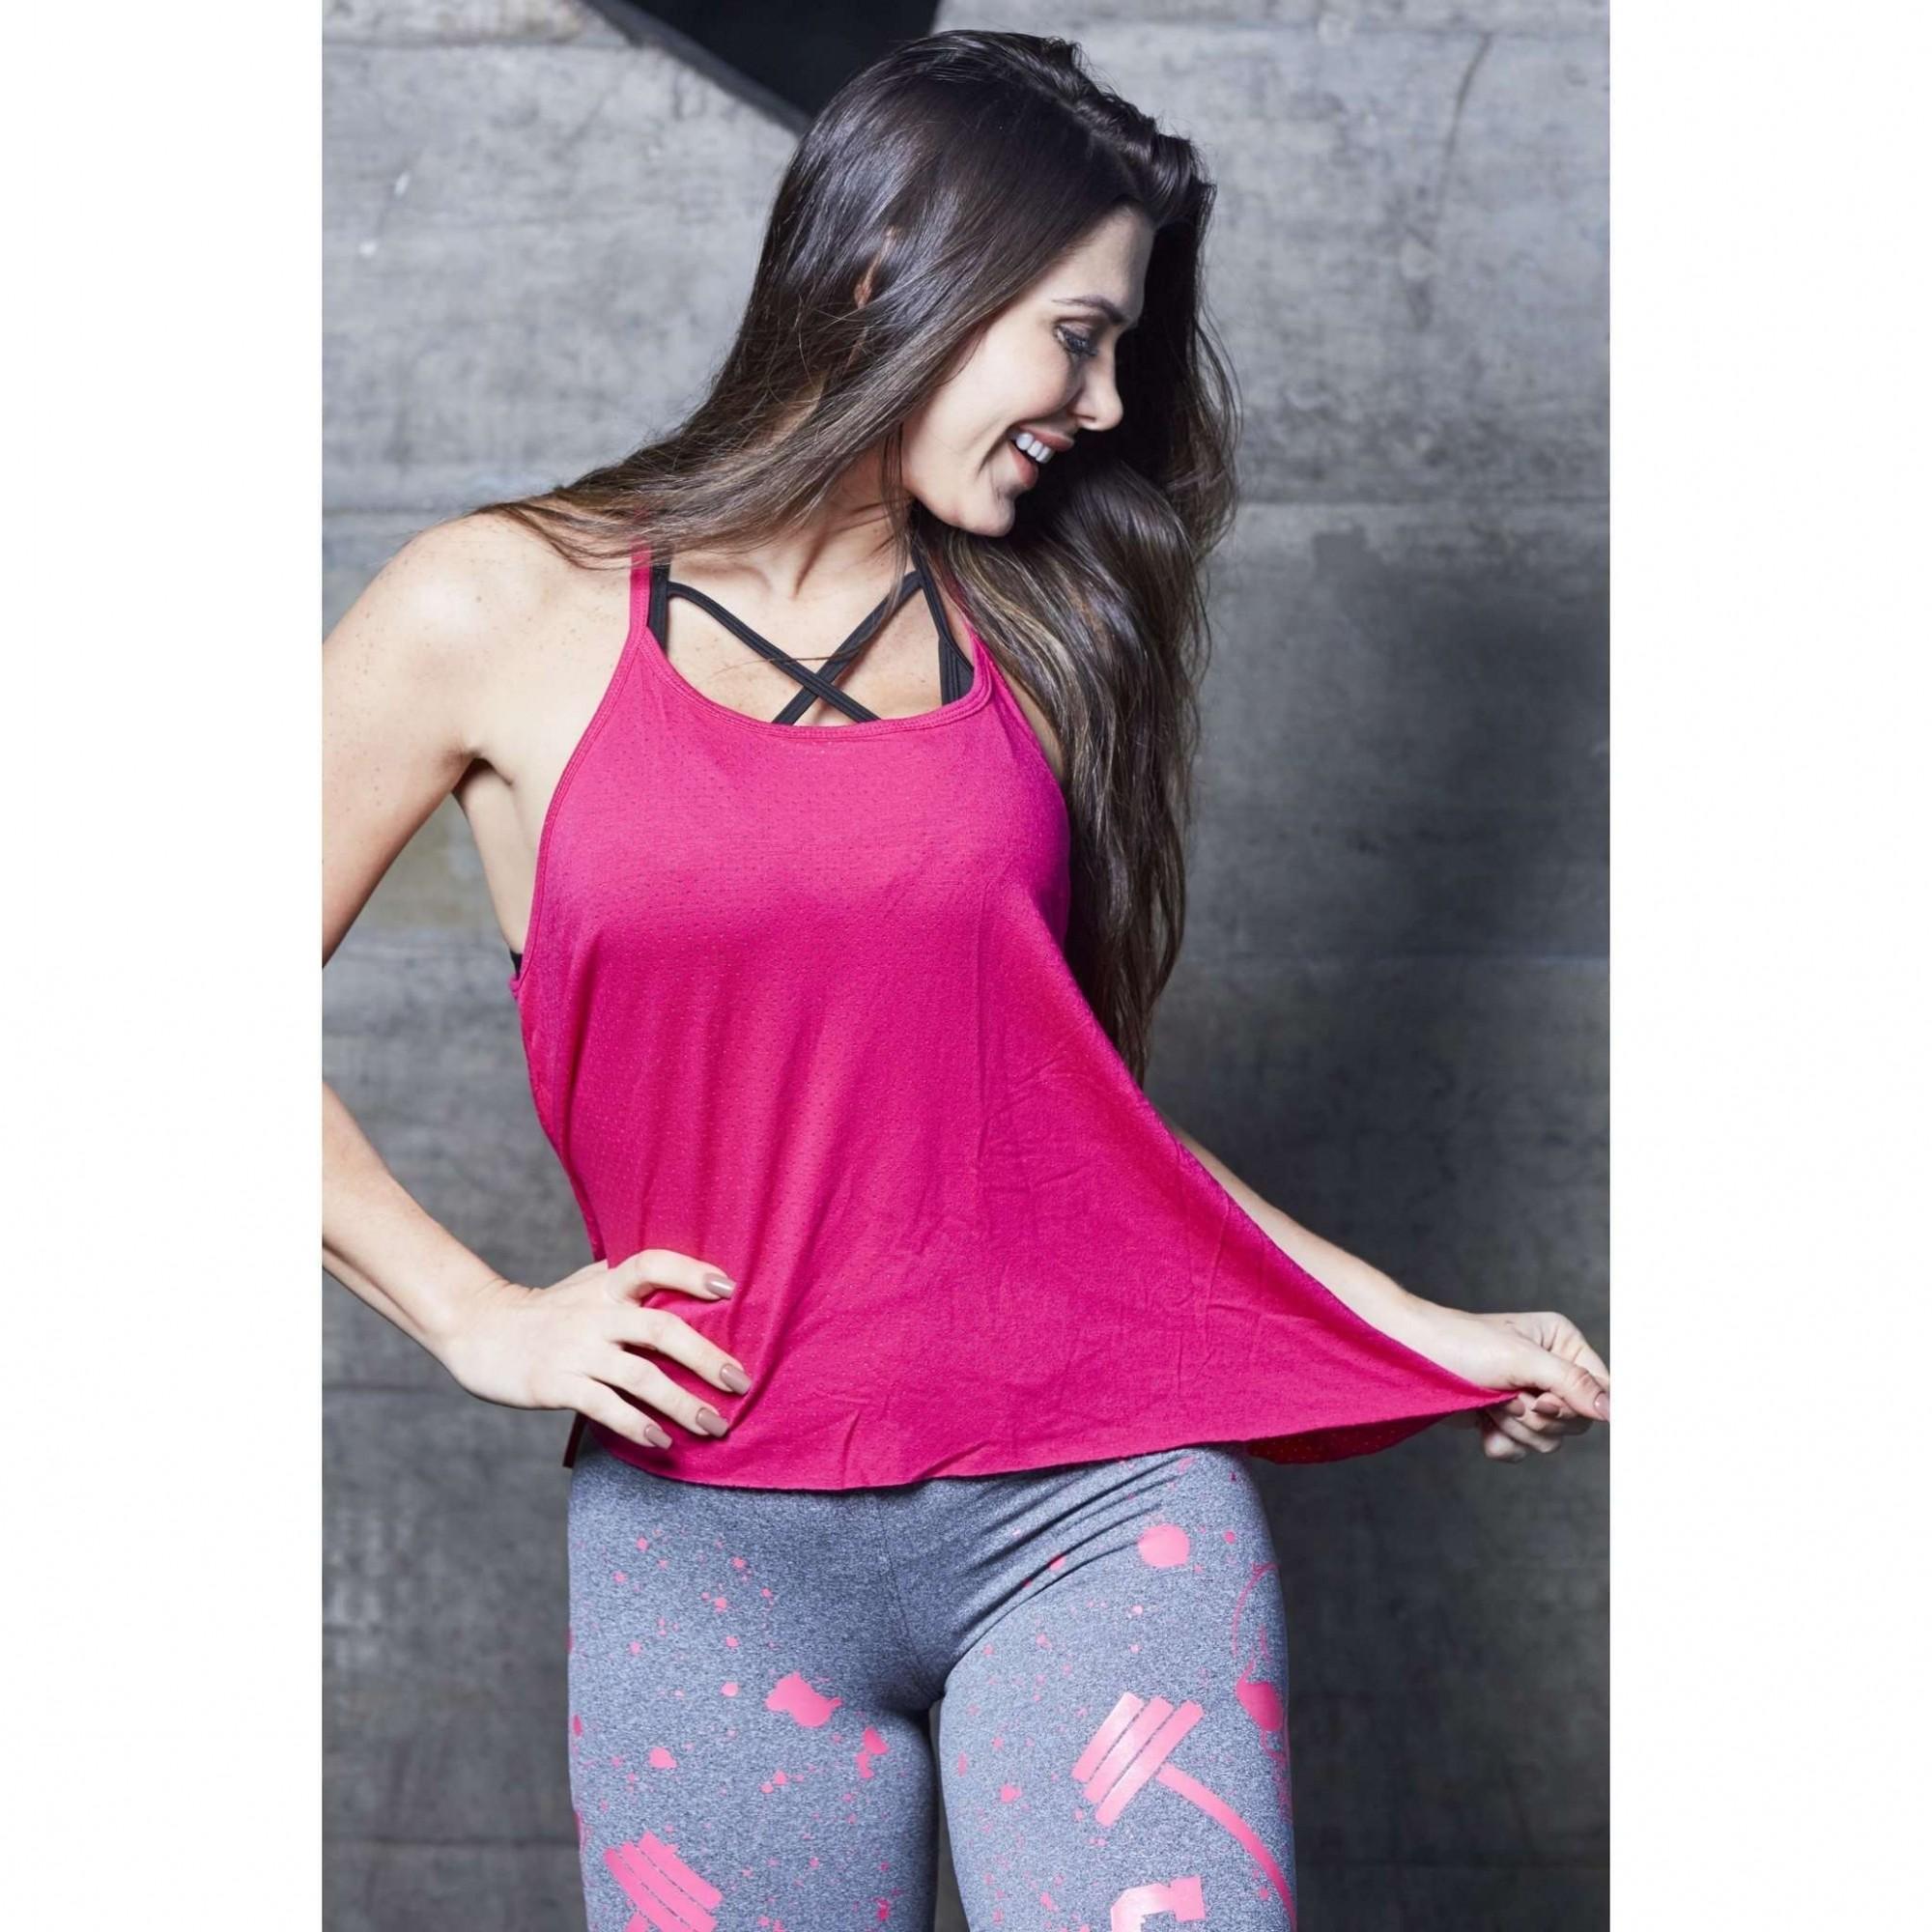 Camiseta Feminina Blusa Fitness Lia Lisa  - Fribasex - Fabricasex.com